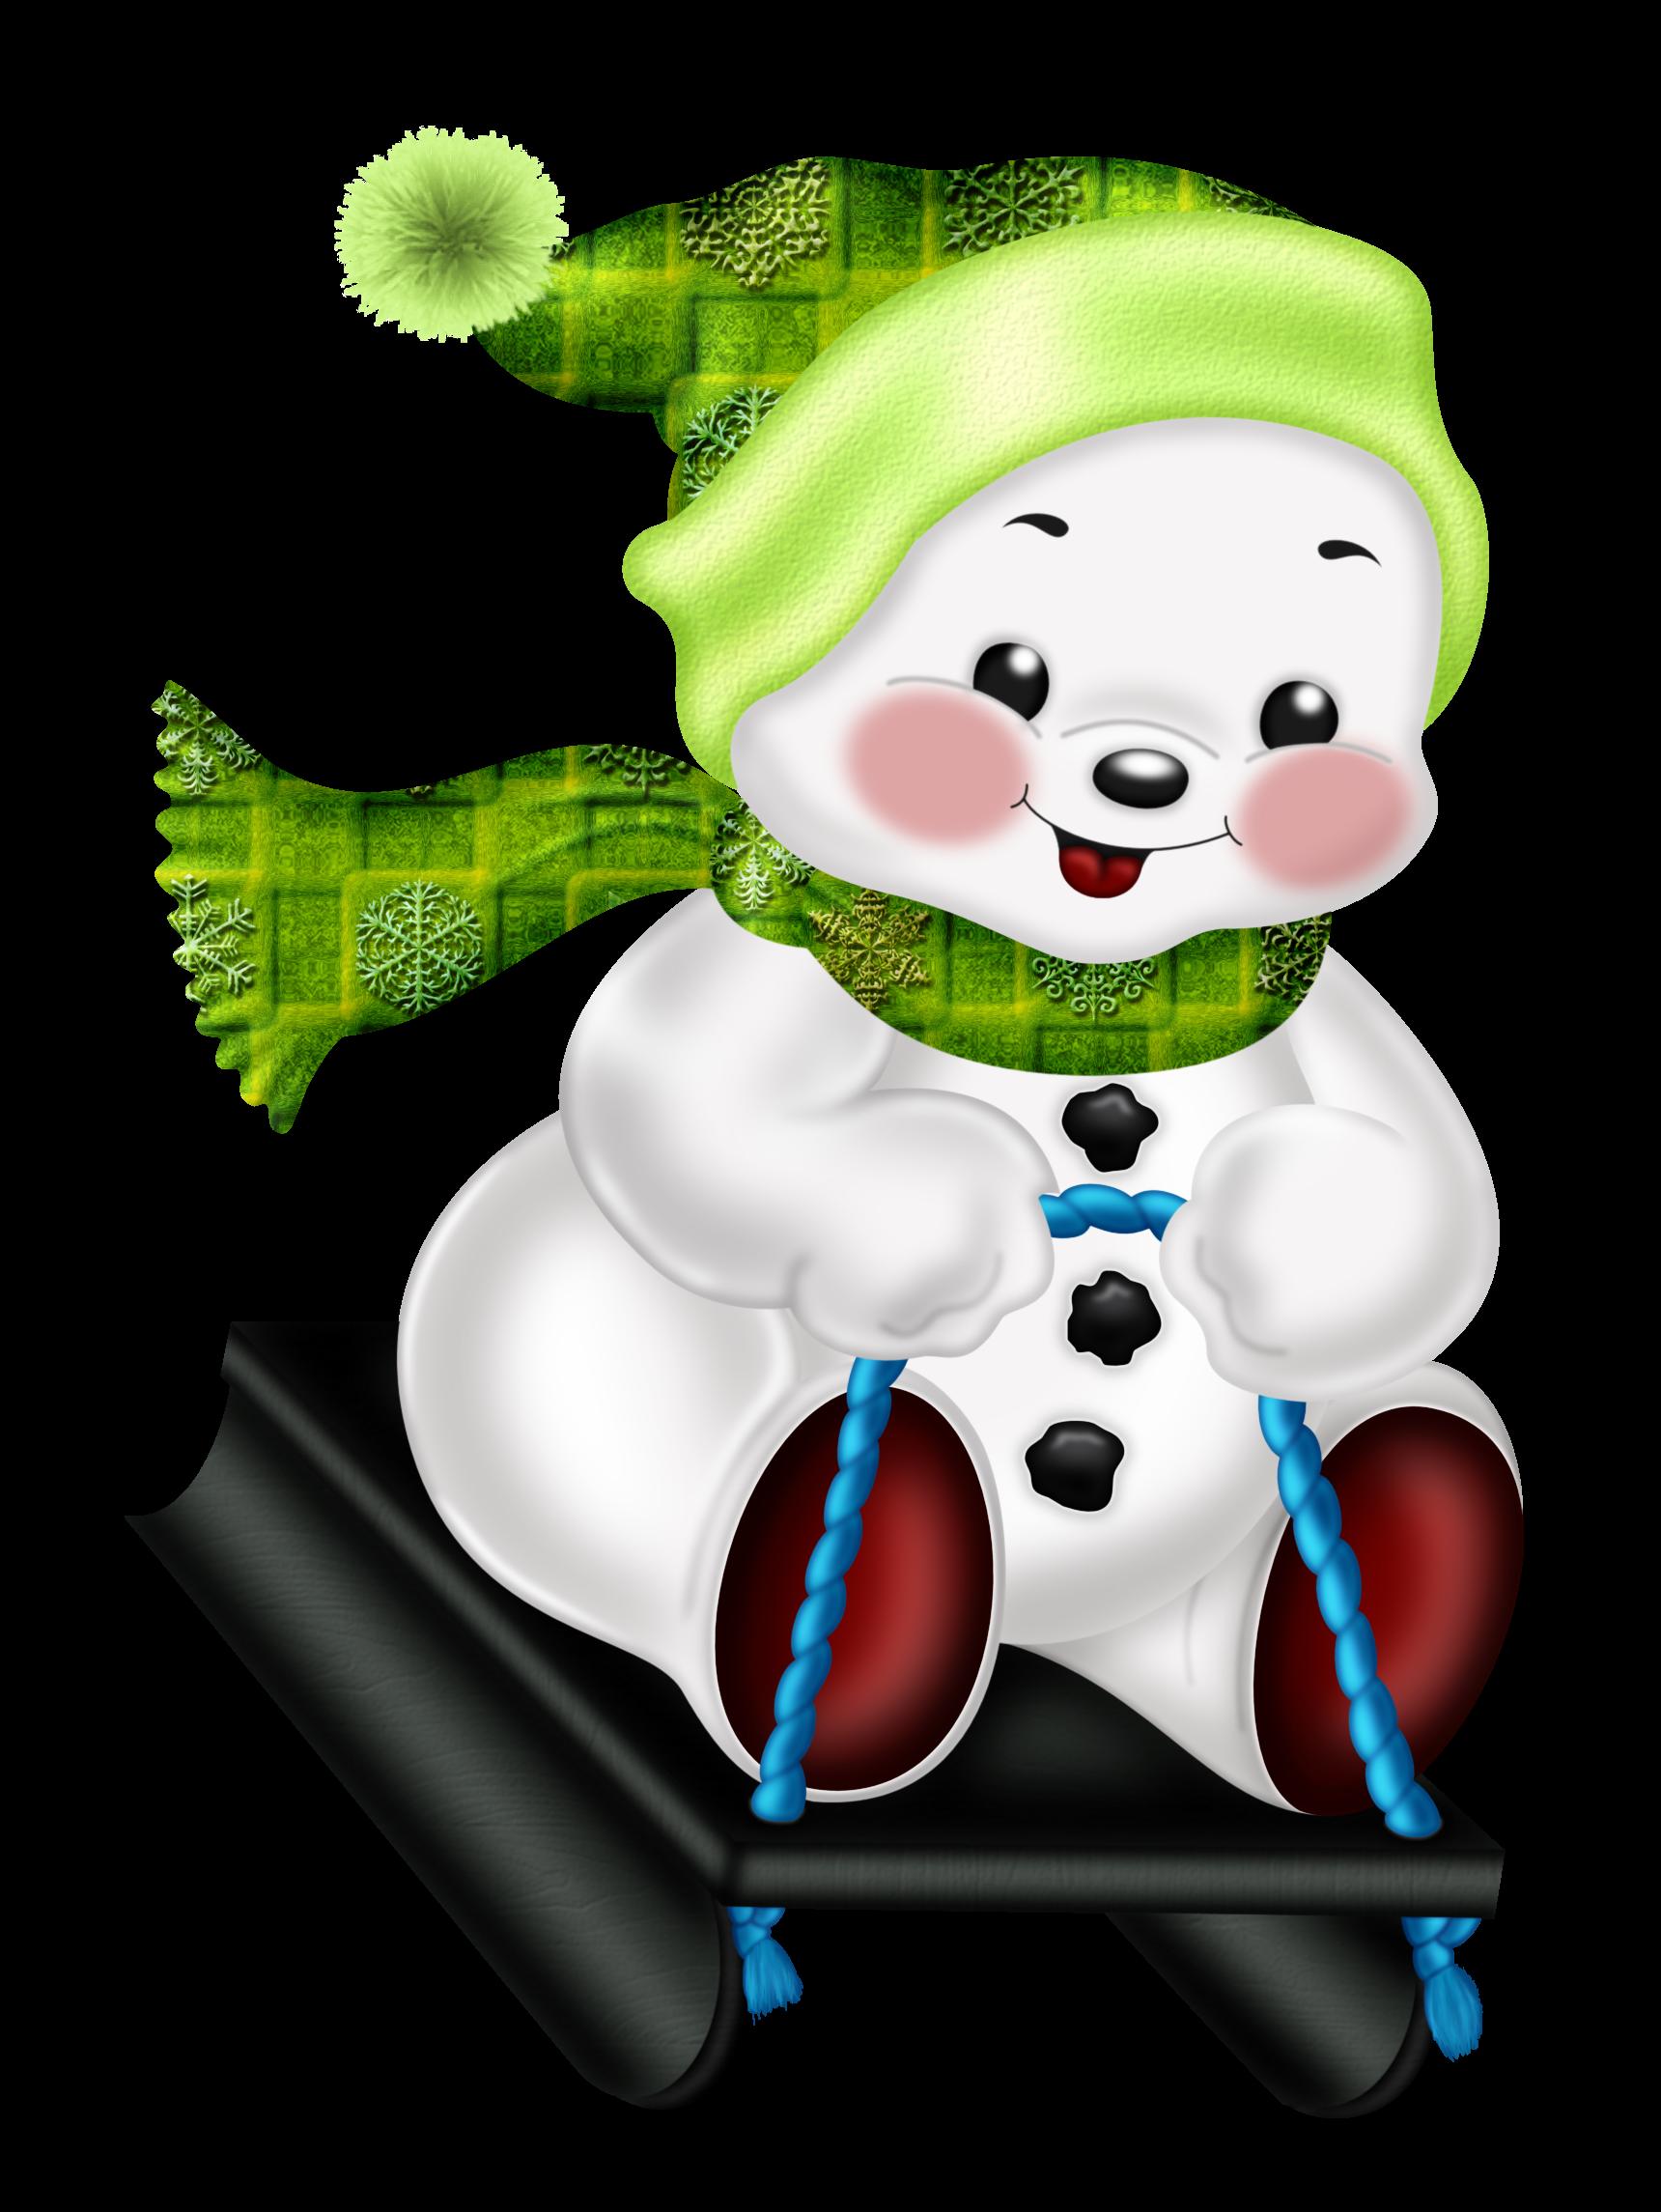 Muneco Nieve Dibujo De Navidad Manualidades Manualidades Navidenas